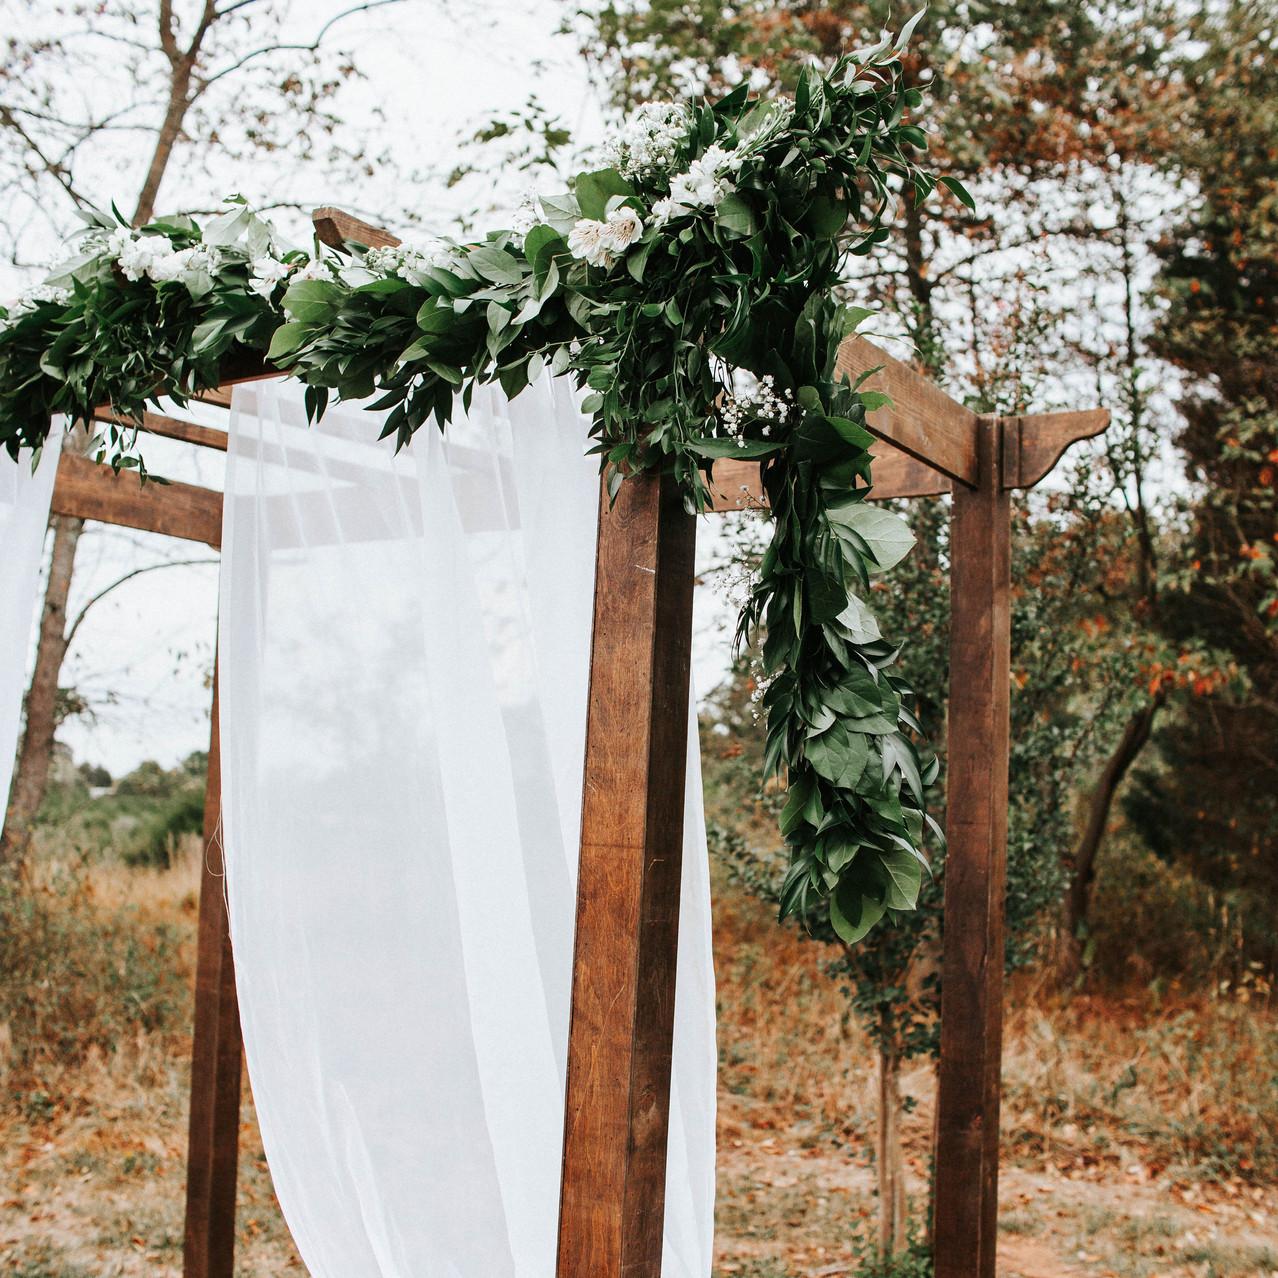 Wedding Altar with Sheer Drape and Greenery